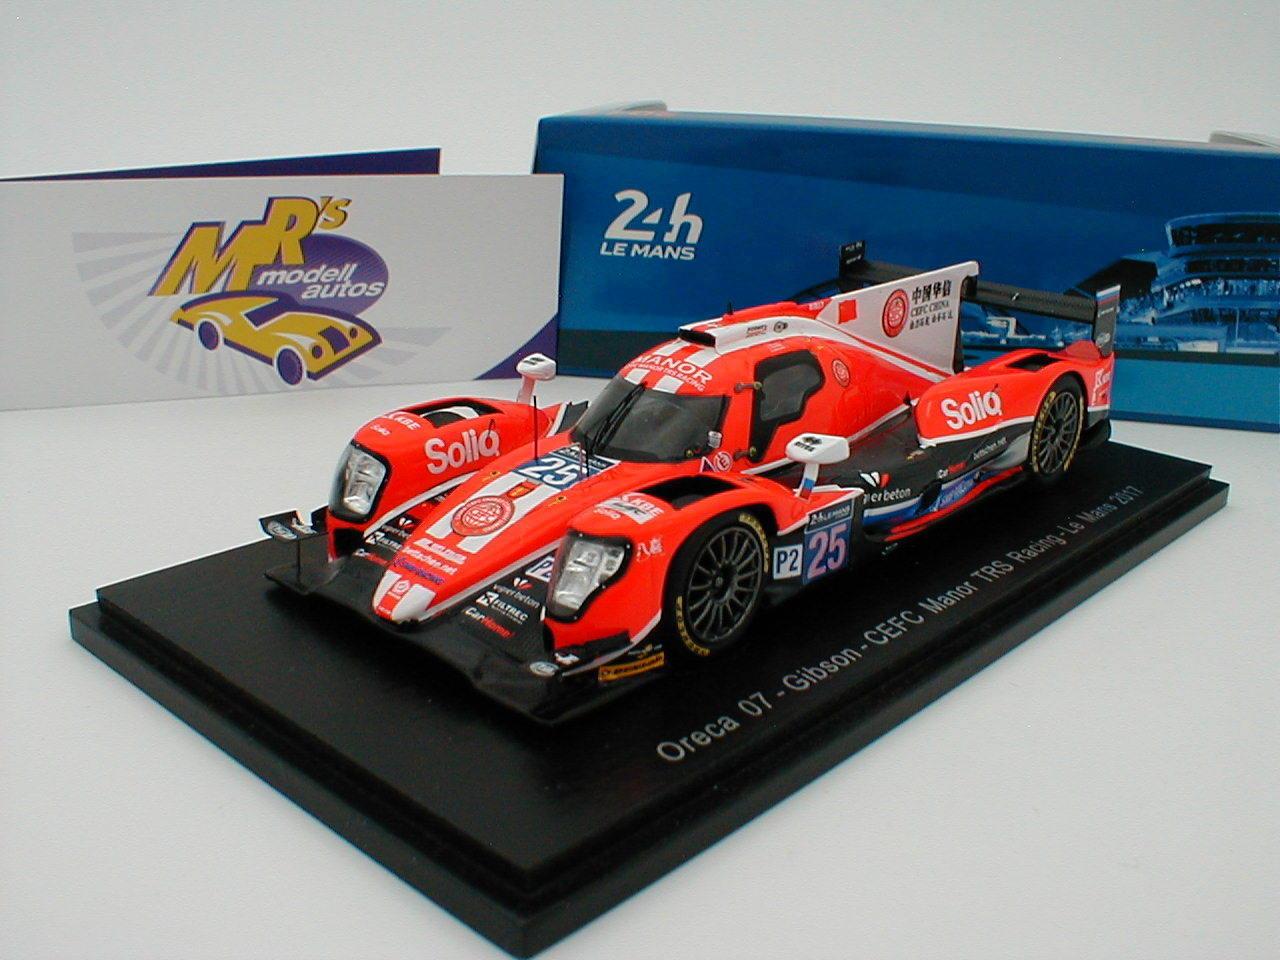 Spark s5812 Oreca 07 Gibson cefc Manor 24h. LE Mans 2017 No. 25 TRS racing 1 43